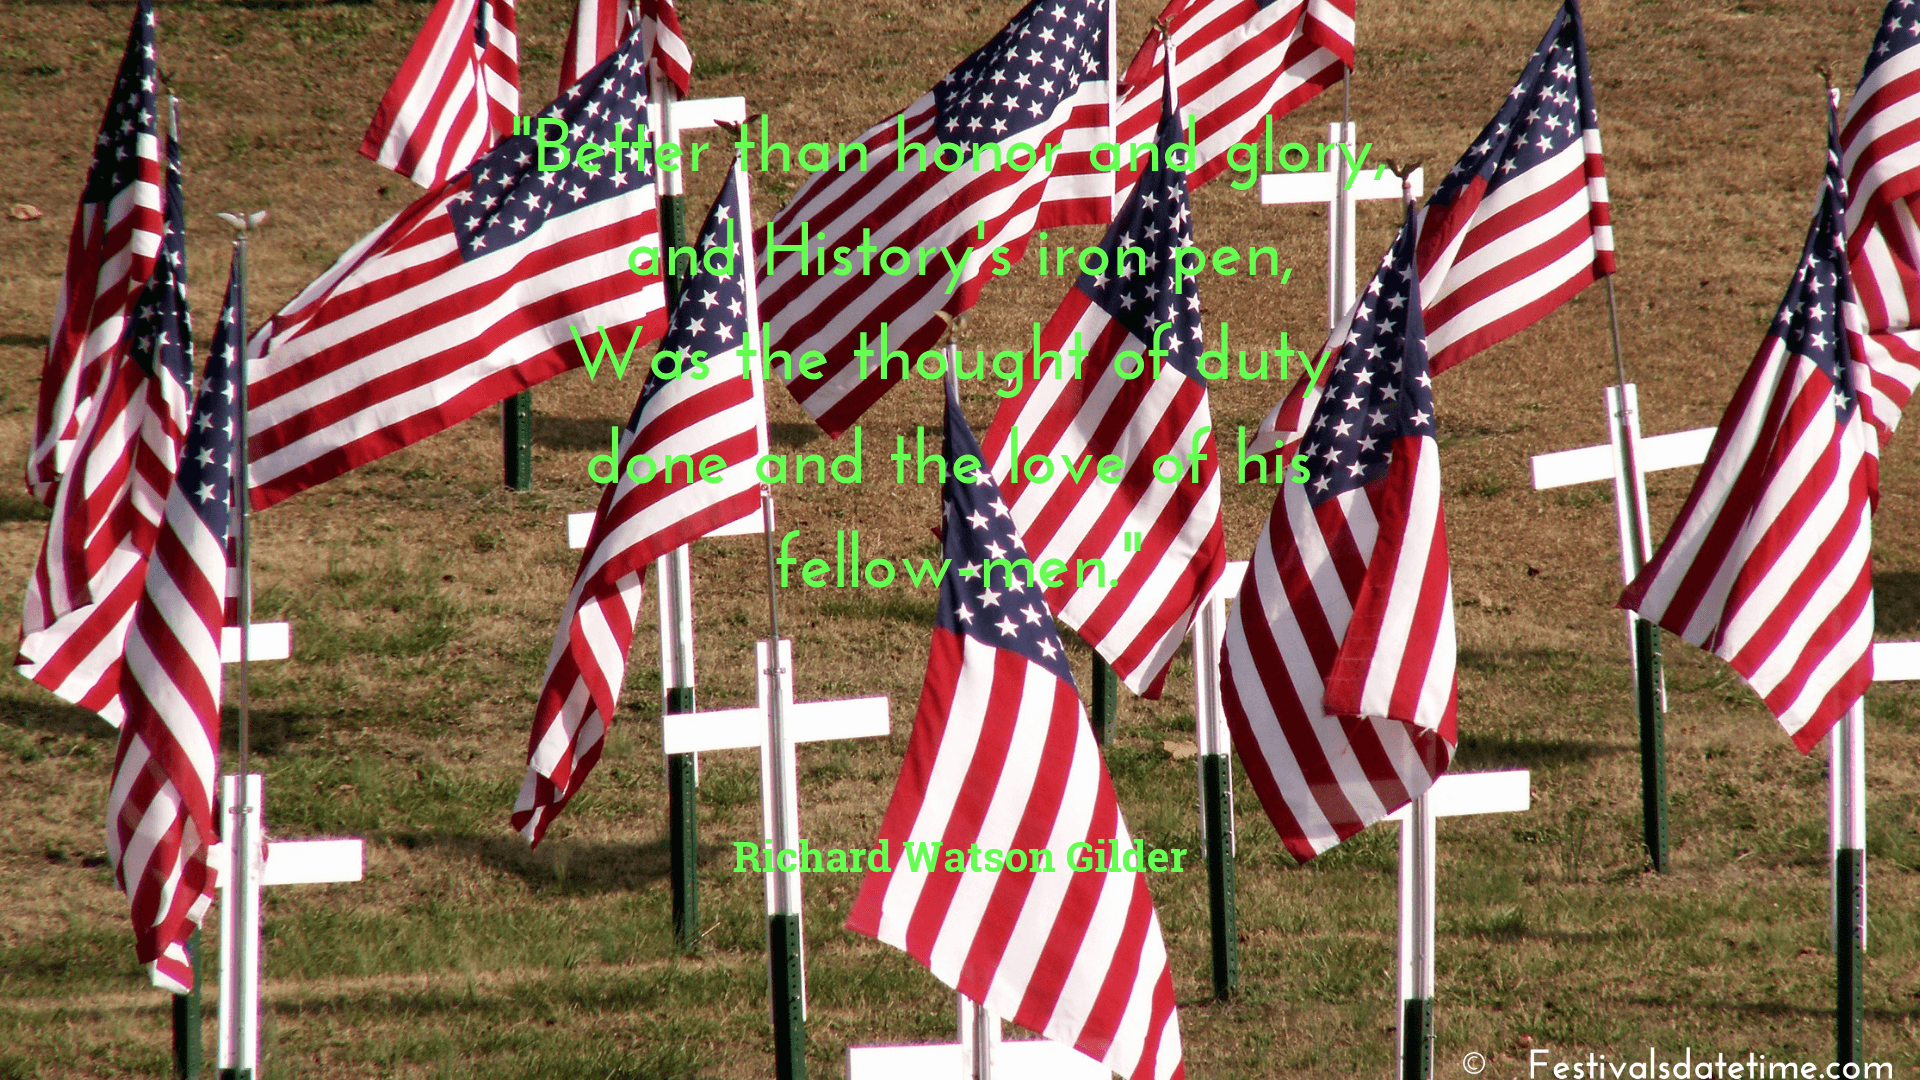 national vietnam war veterans day images